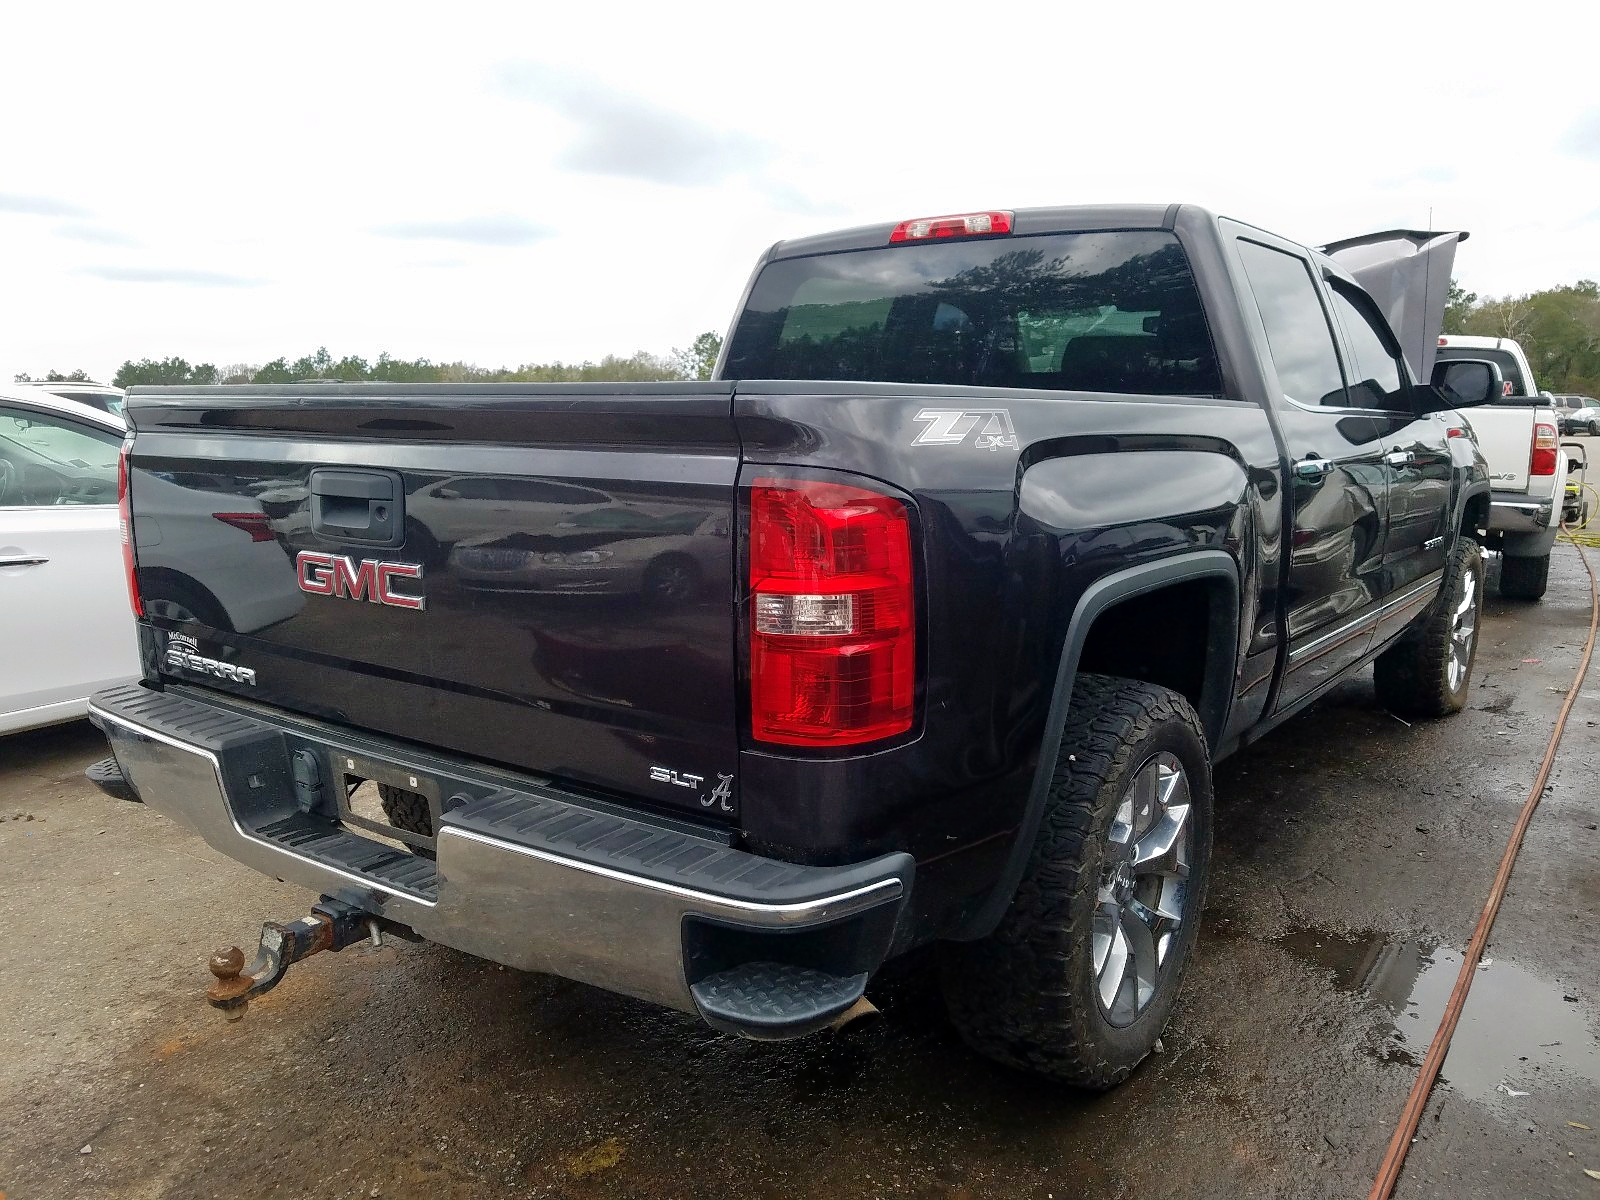 3GTU2VEC2EG508713 - 2014 Gmc Sierra K15 5.3L rear view